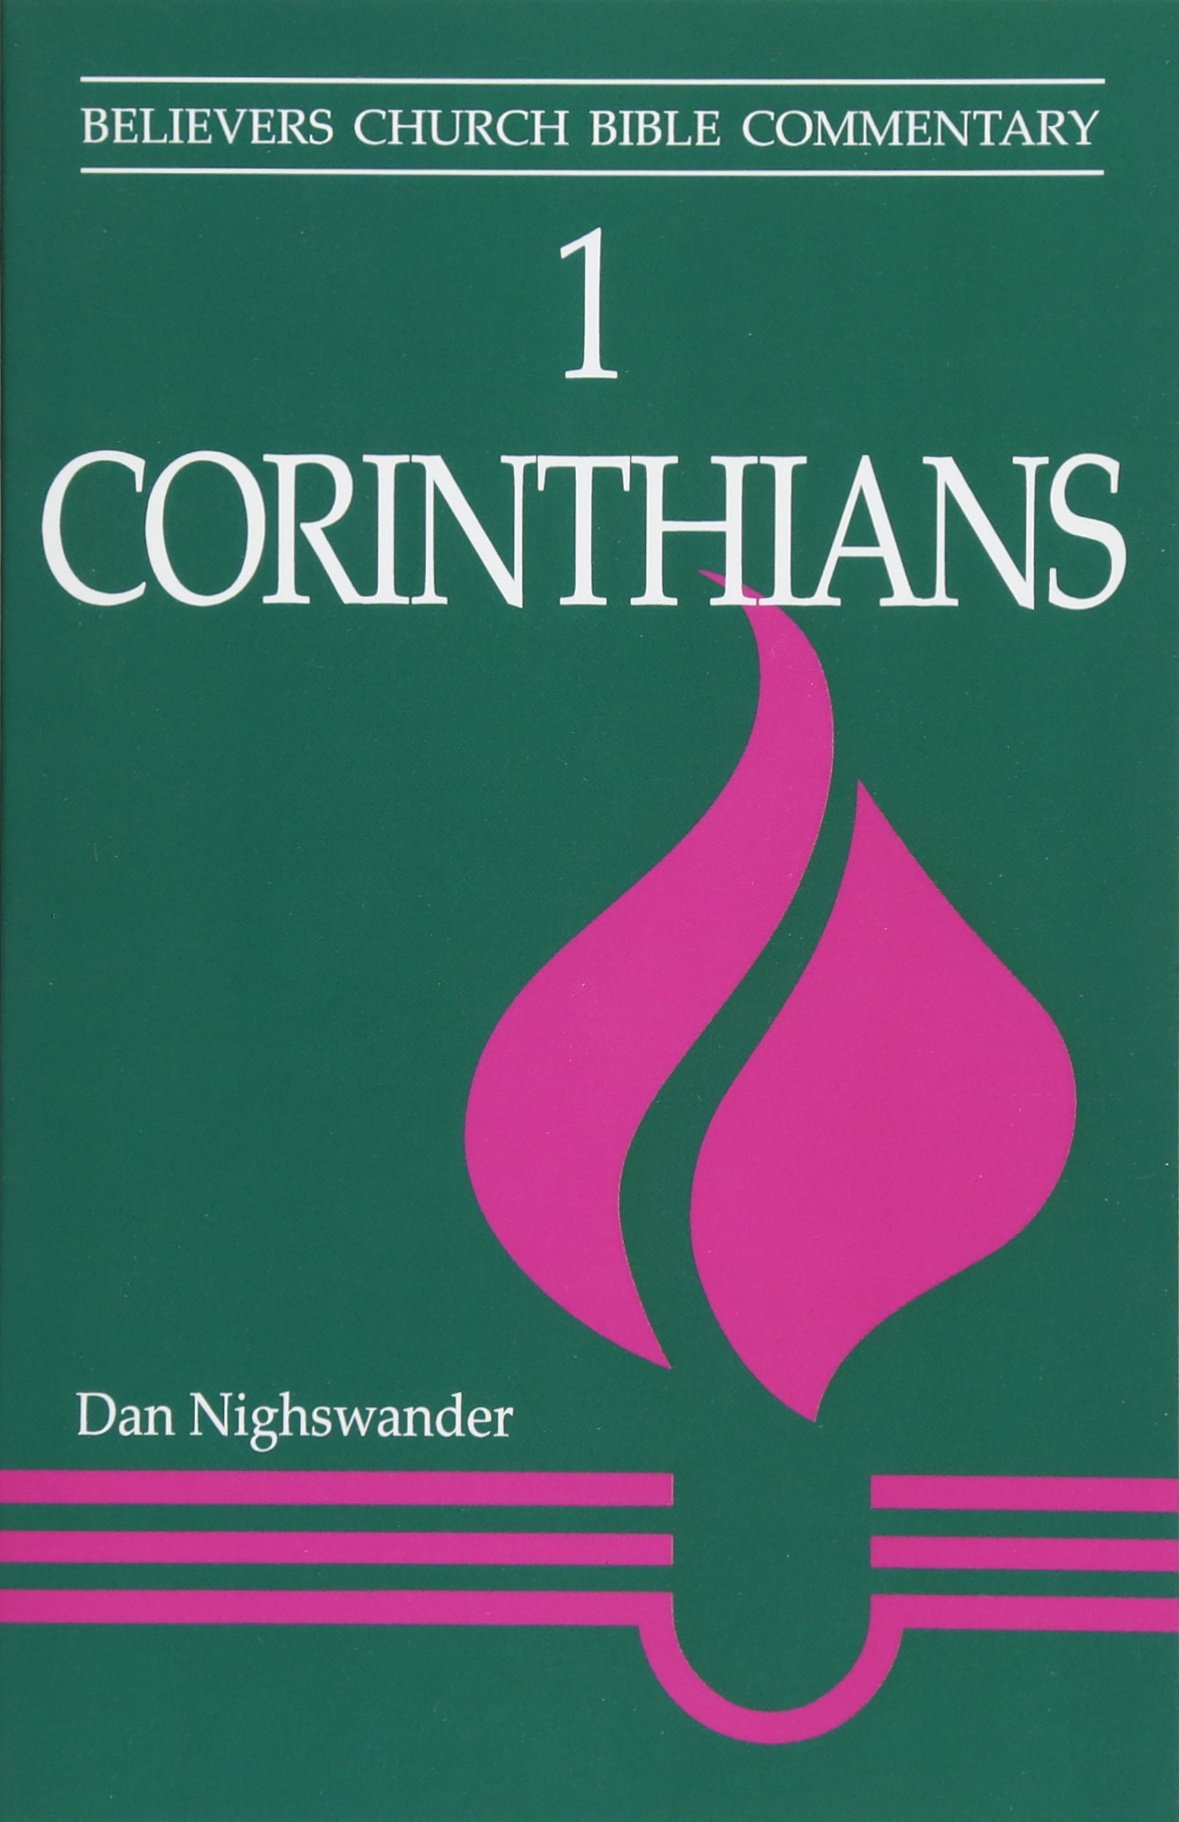 1 Corinthians (Believers Church Bible Commentary) ebook